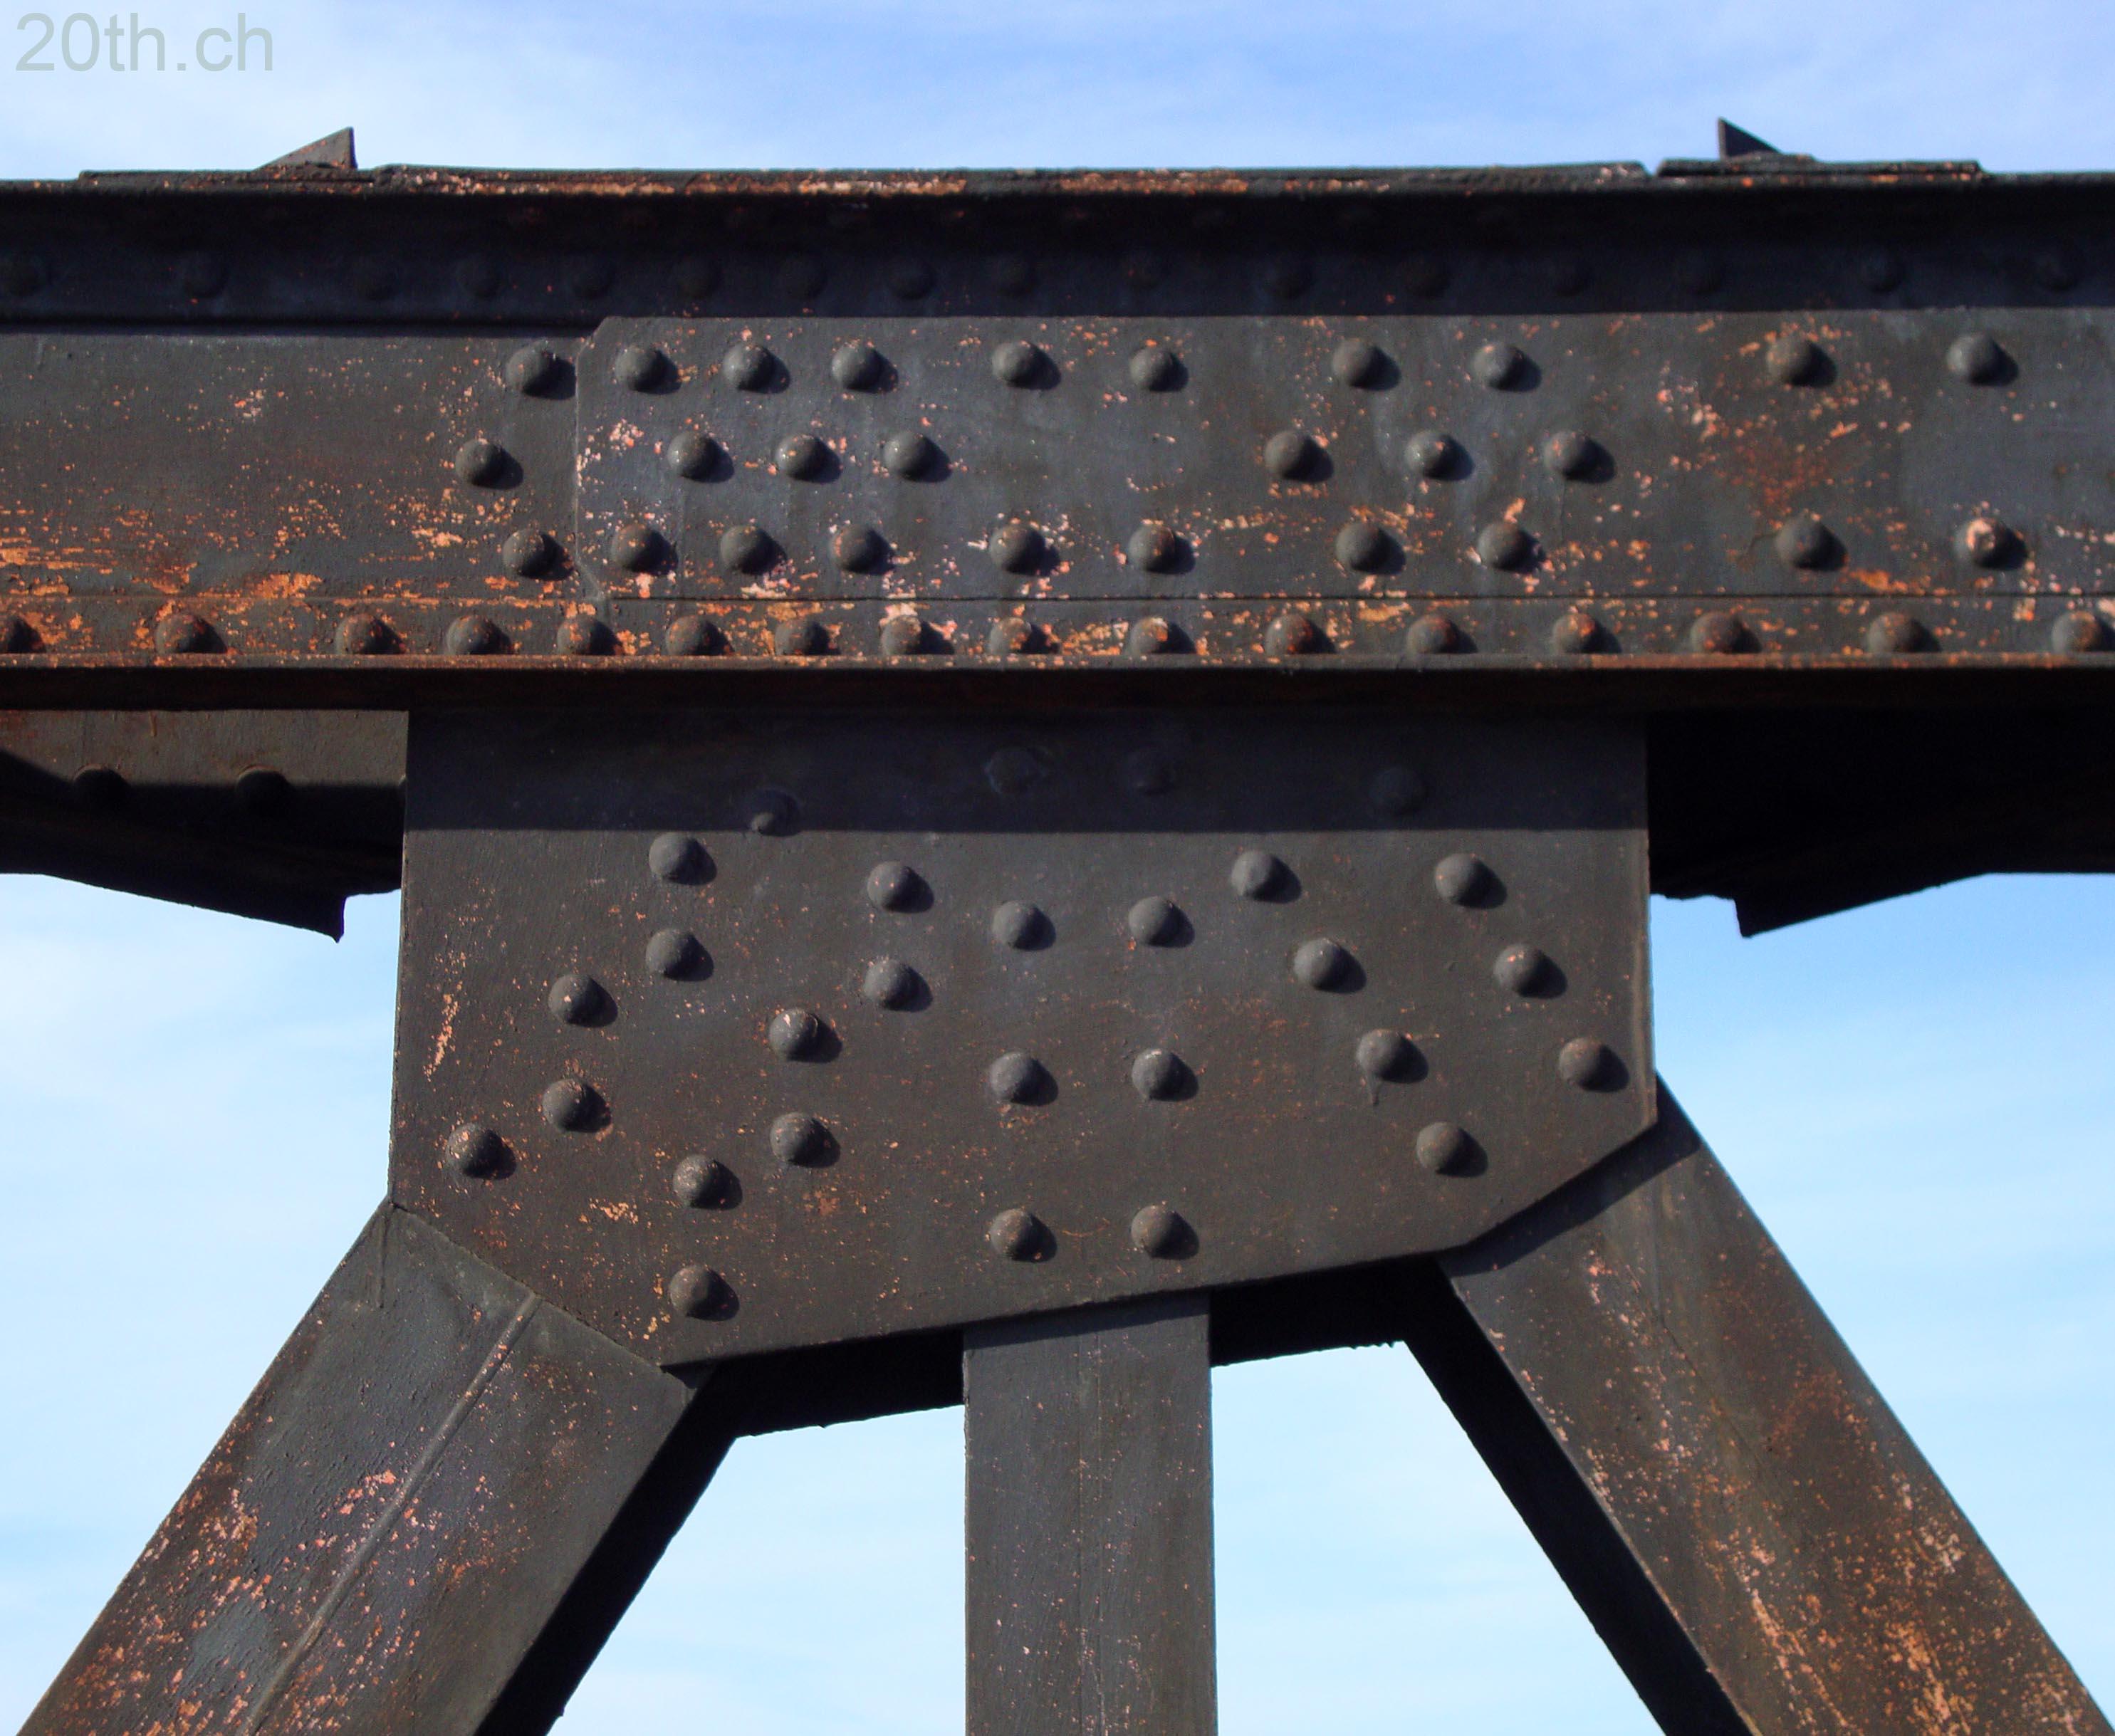 https://www.20th.ch/structure_de_pont_rivetee_ancienne.jpg